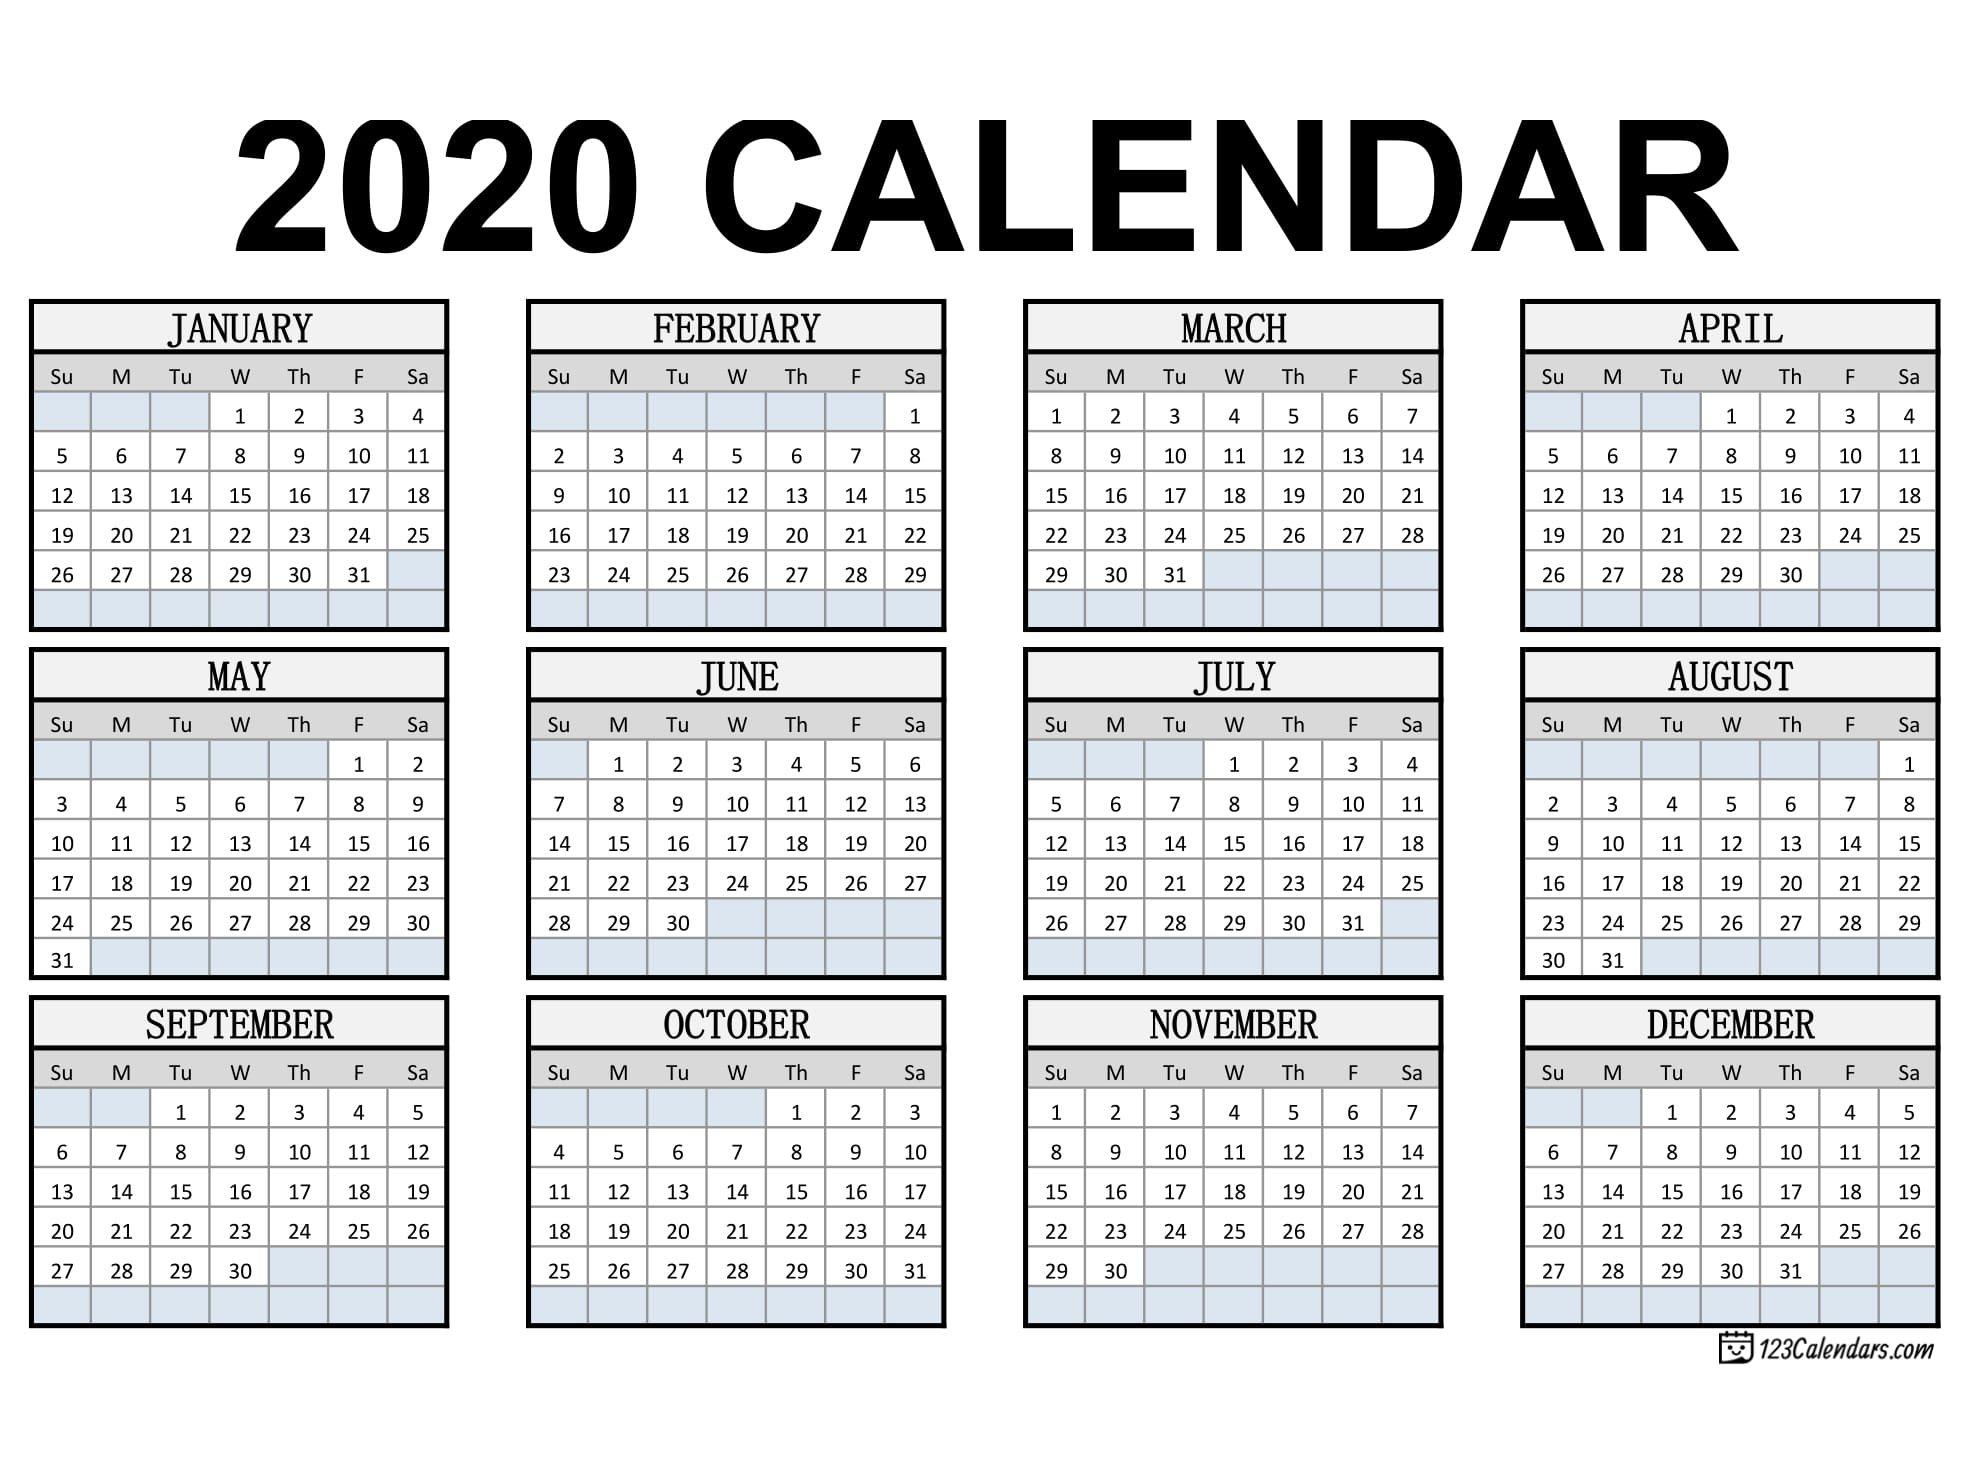 Free Printable 2020 Calendar | 123Calendars Printable Month Calendar With Times